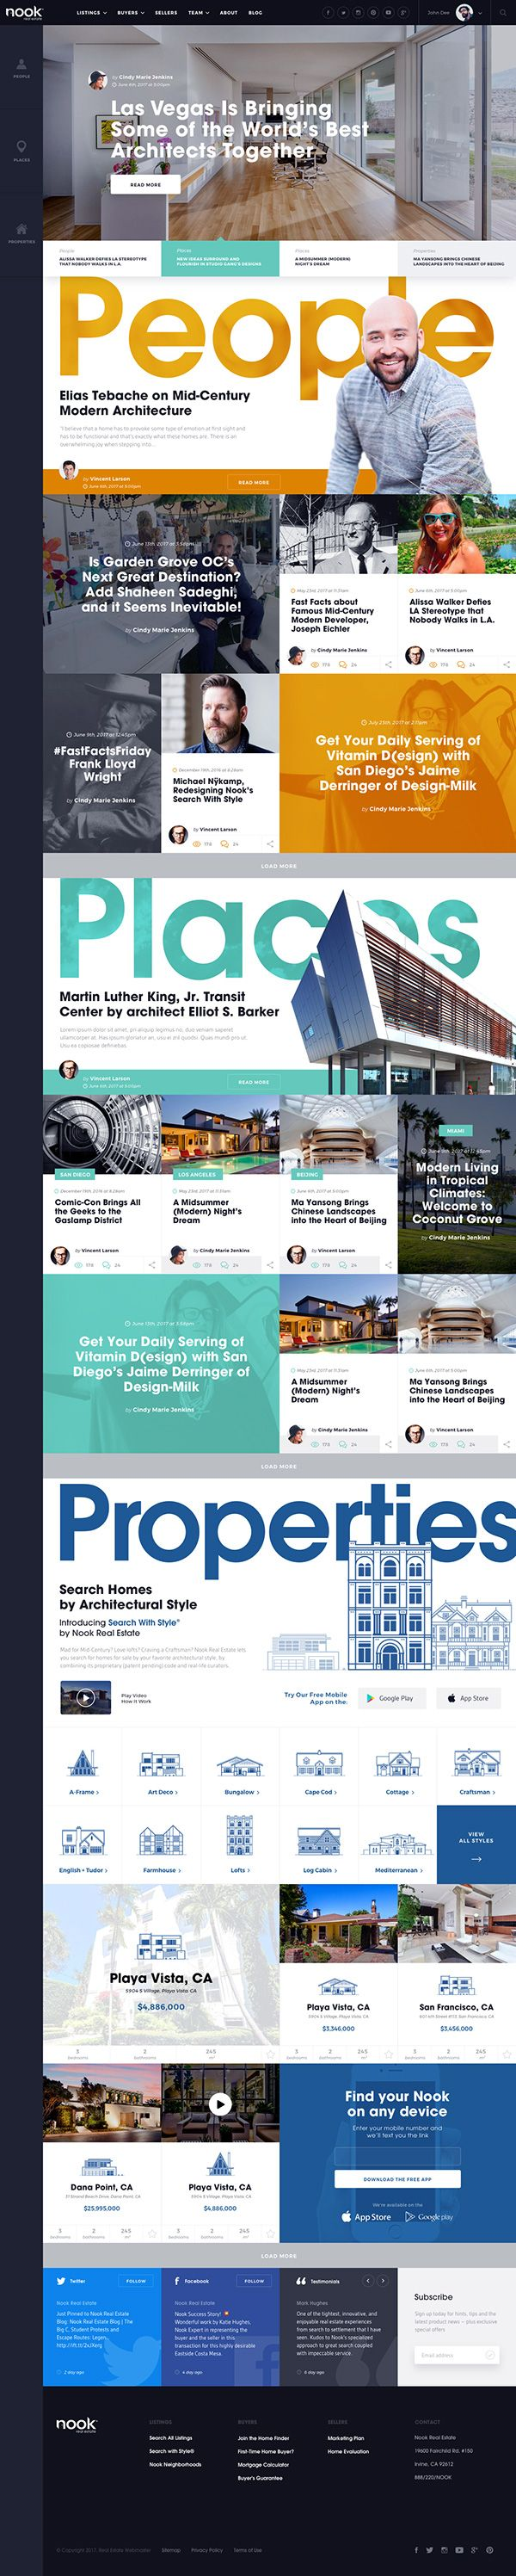 Homepage Design Concept for a Modern Architecture & Design Blog